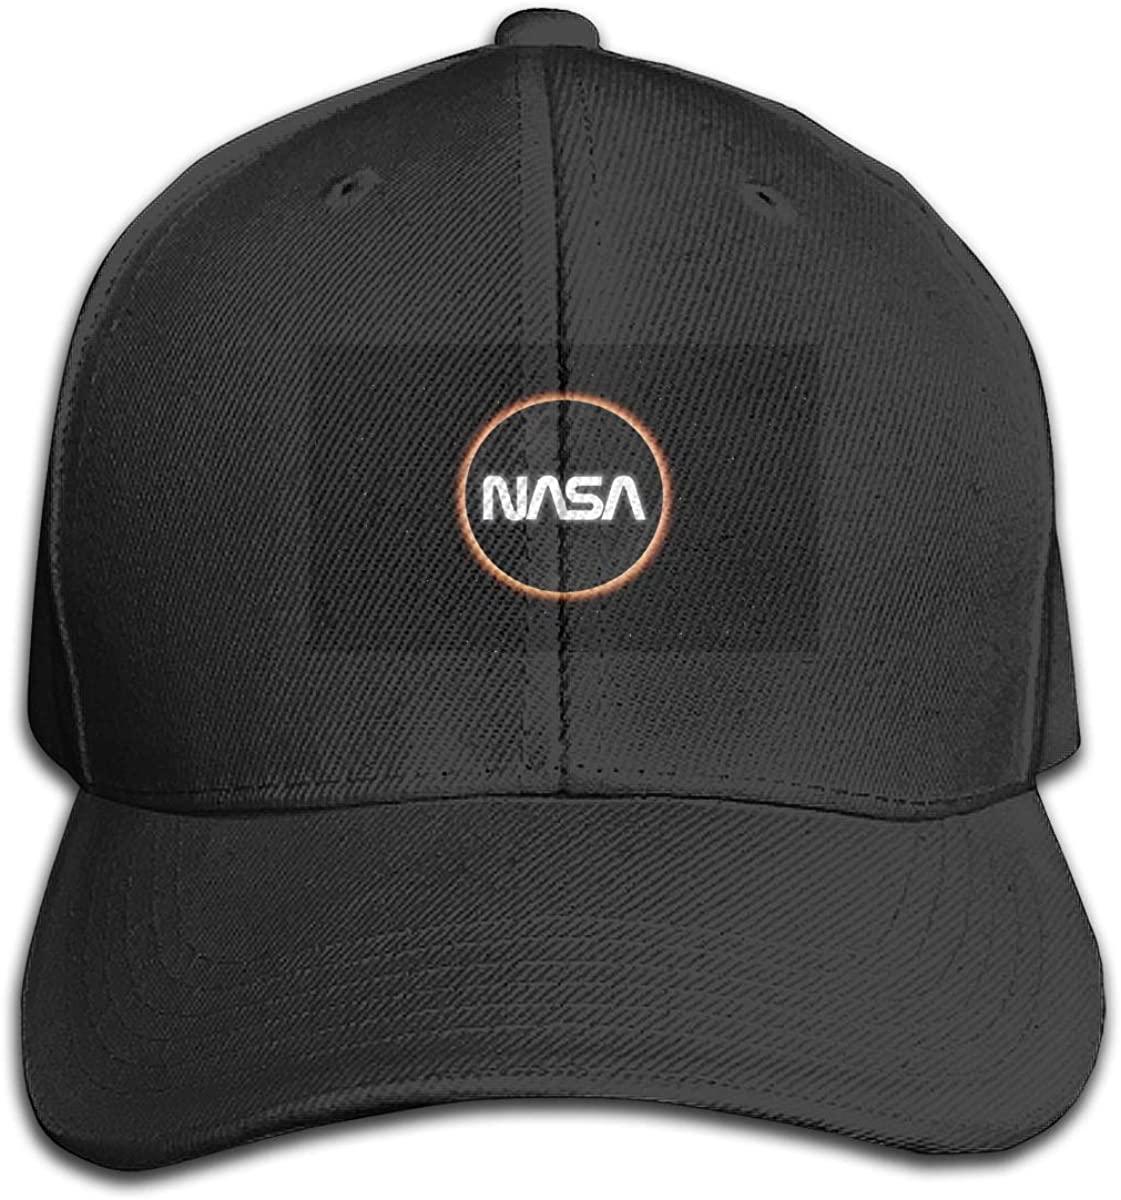 QSMX NASA Bucket Hat Dad Hat Collection Baseball Cap Polo Adjustable Snapback Cap